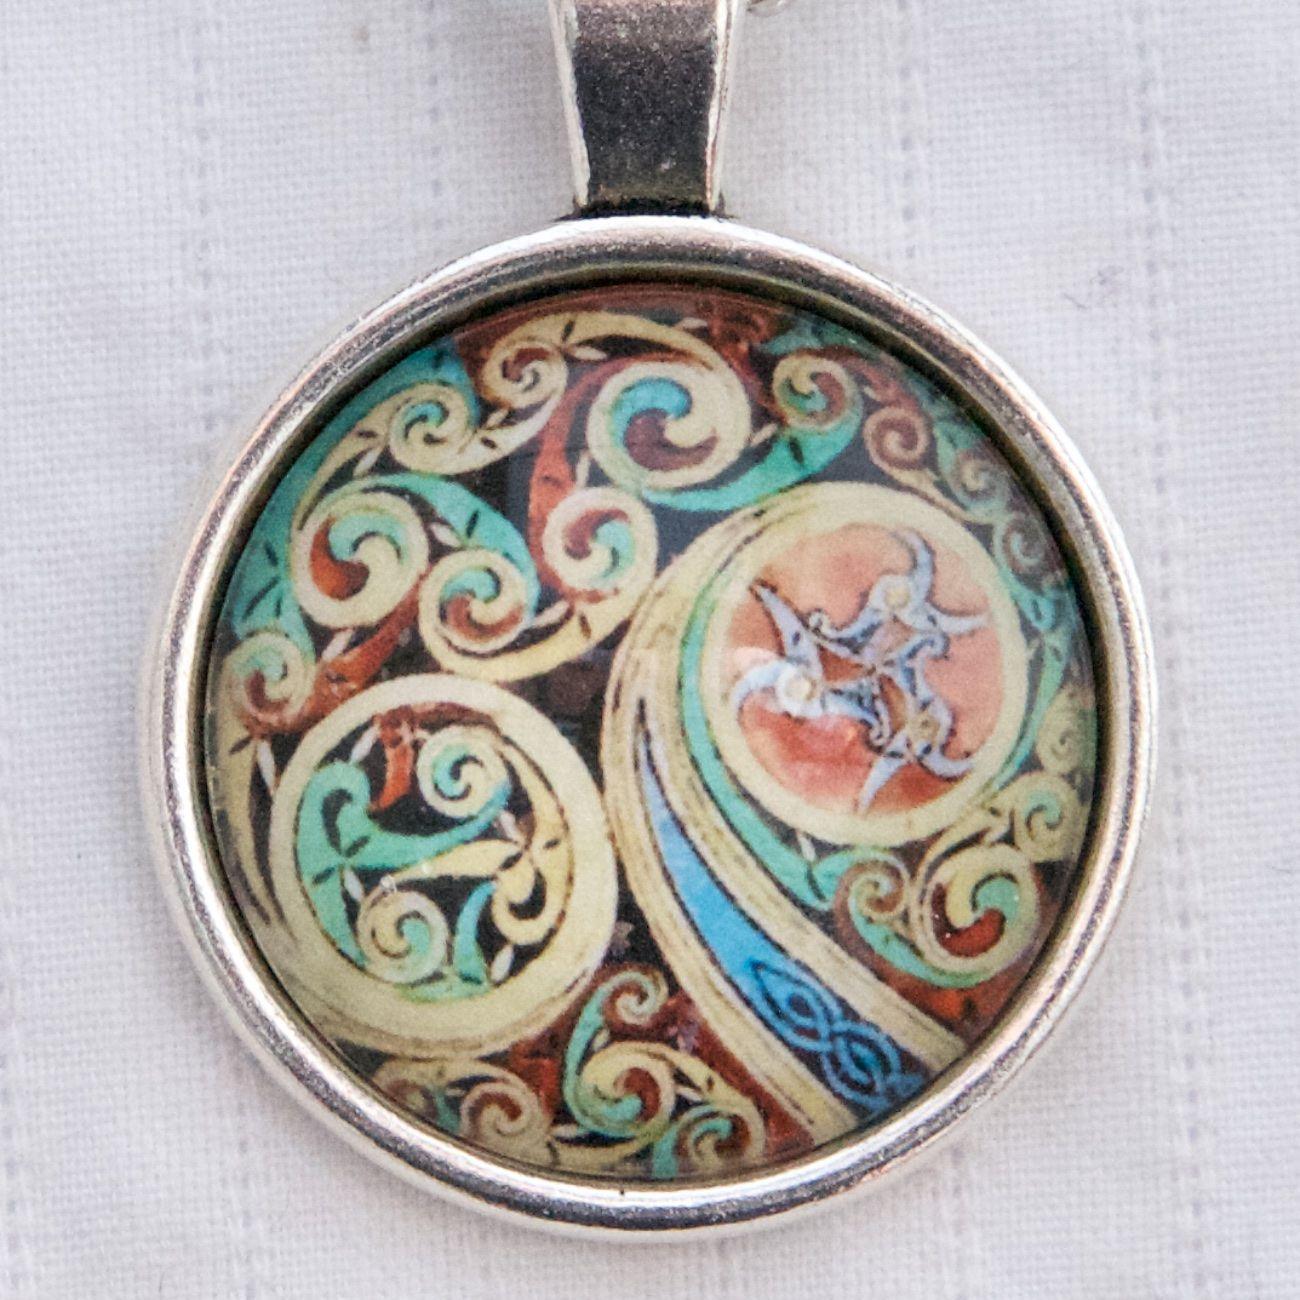 Haeckel siphonphore pendant